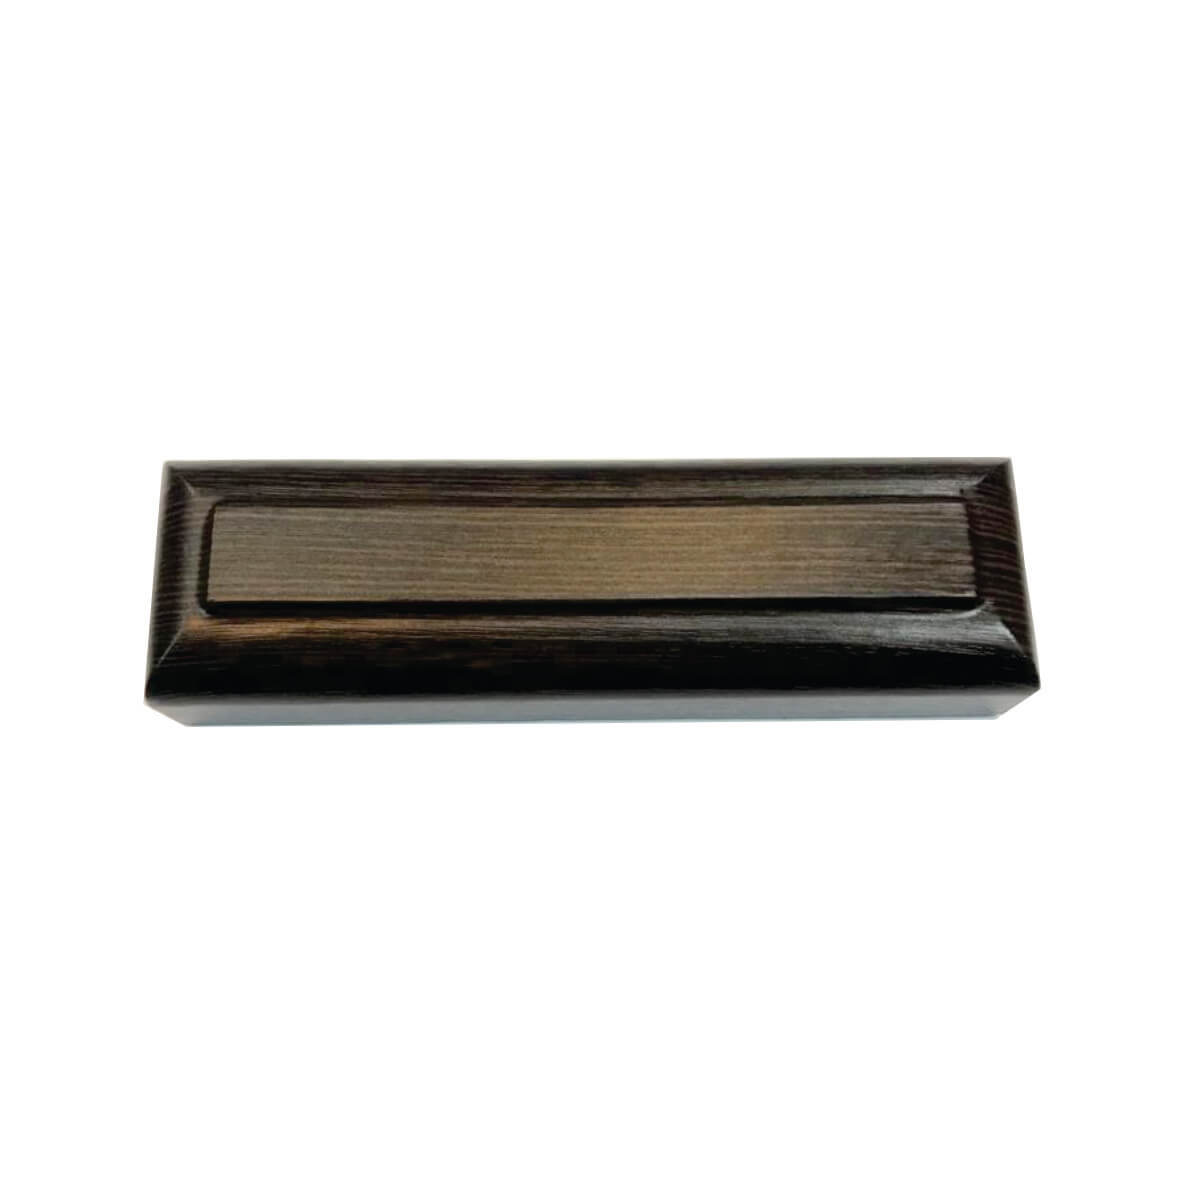 پایه تندیس چوبی کد 001